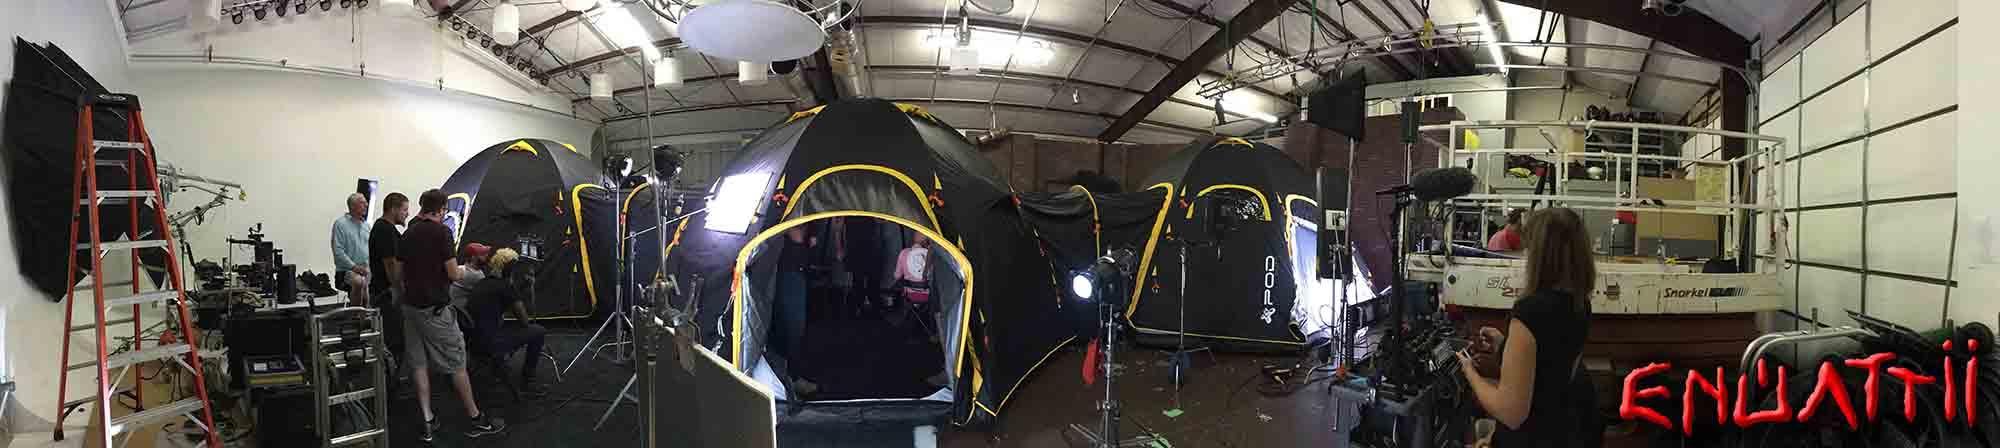 enuattii-pano-tent-set